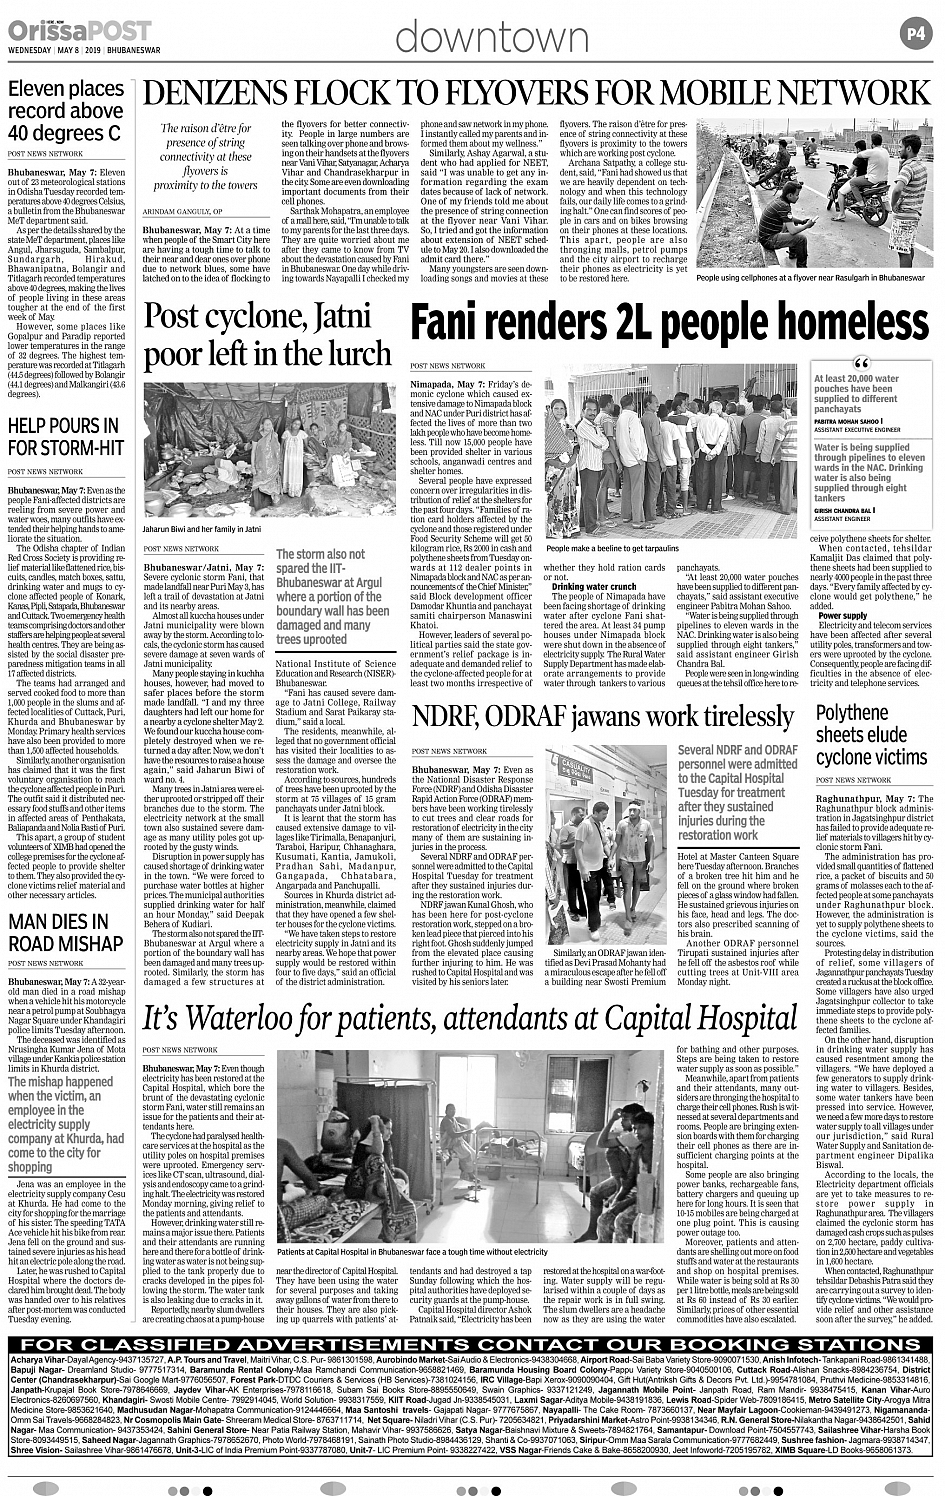 OrissaPost Page: 4 - OrissaPOST Epaper | Online English ePaper